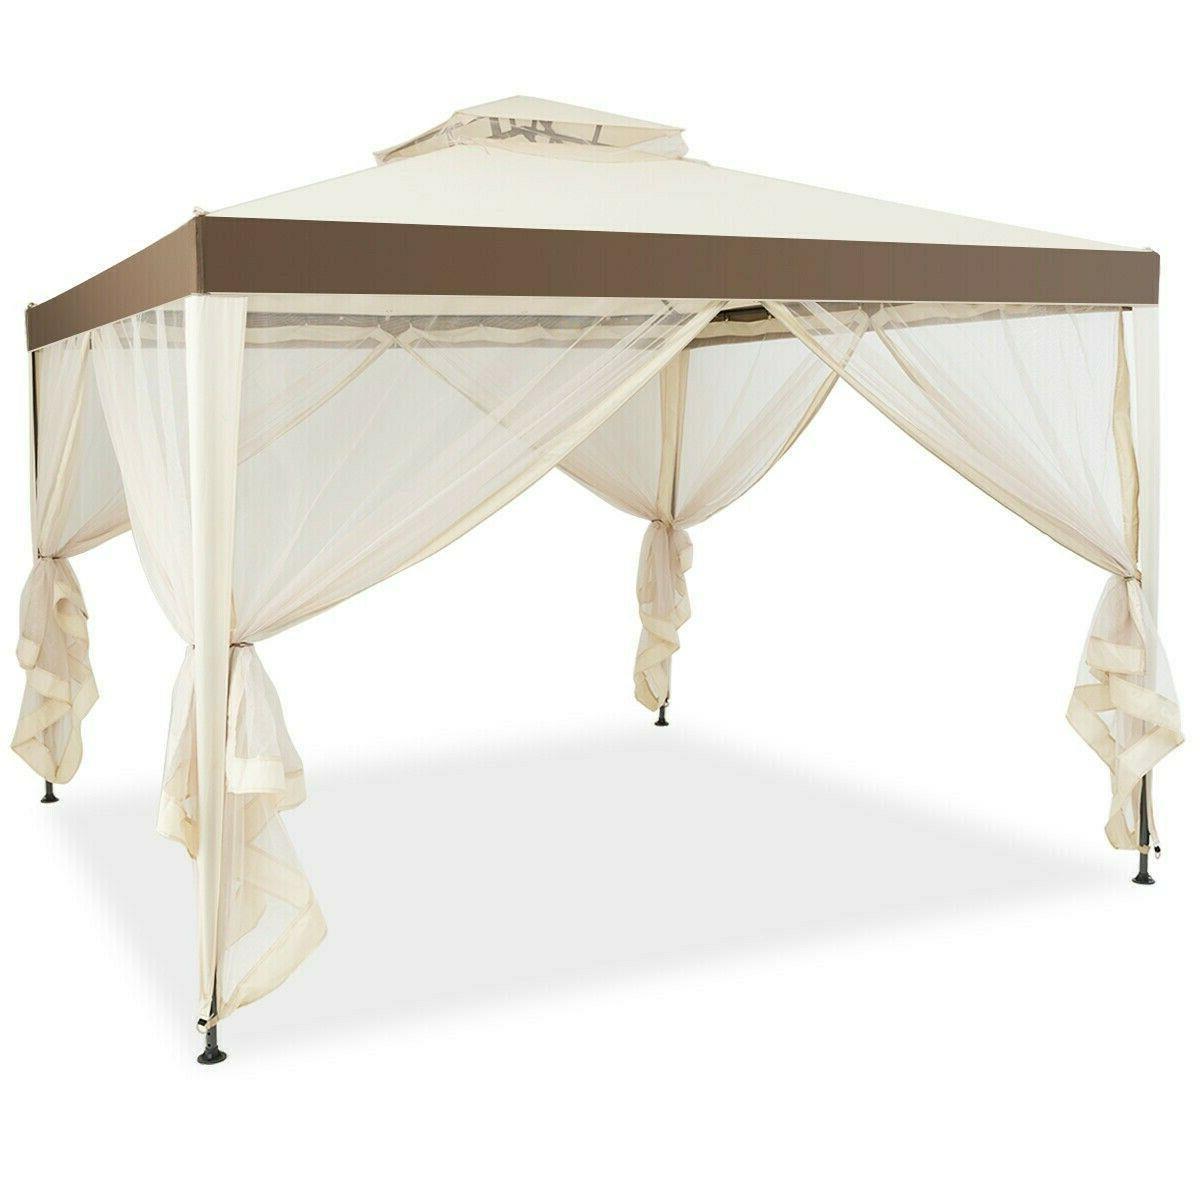 10' X 10' Outdoor Gazebo Steel Frame Gazebo Lawn Tent